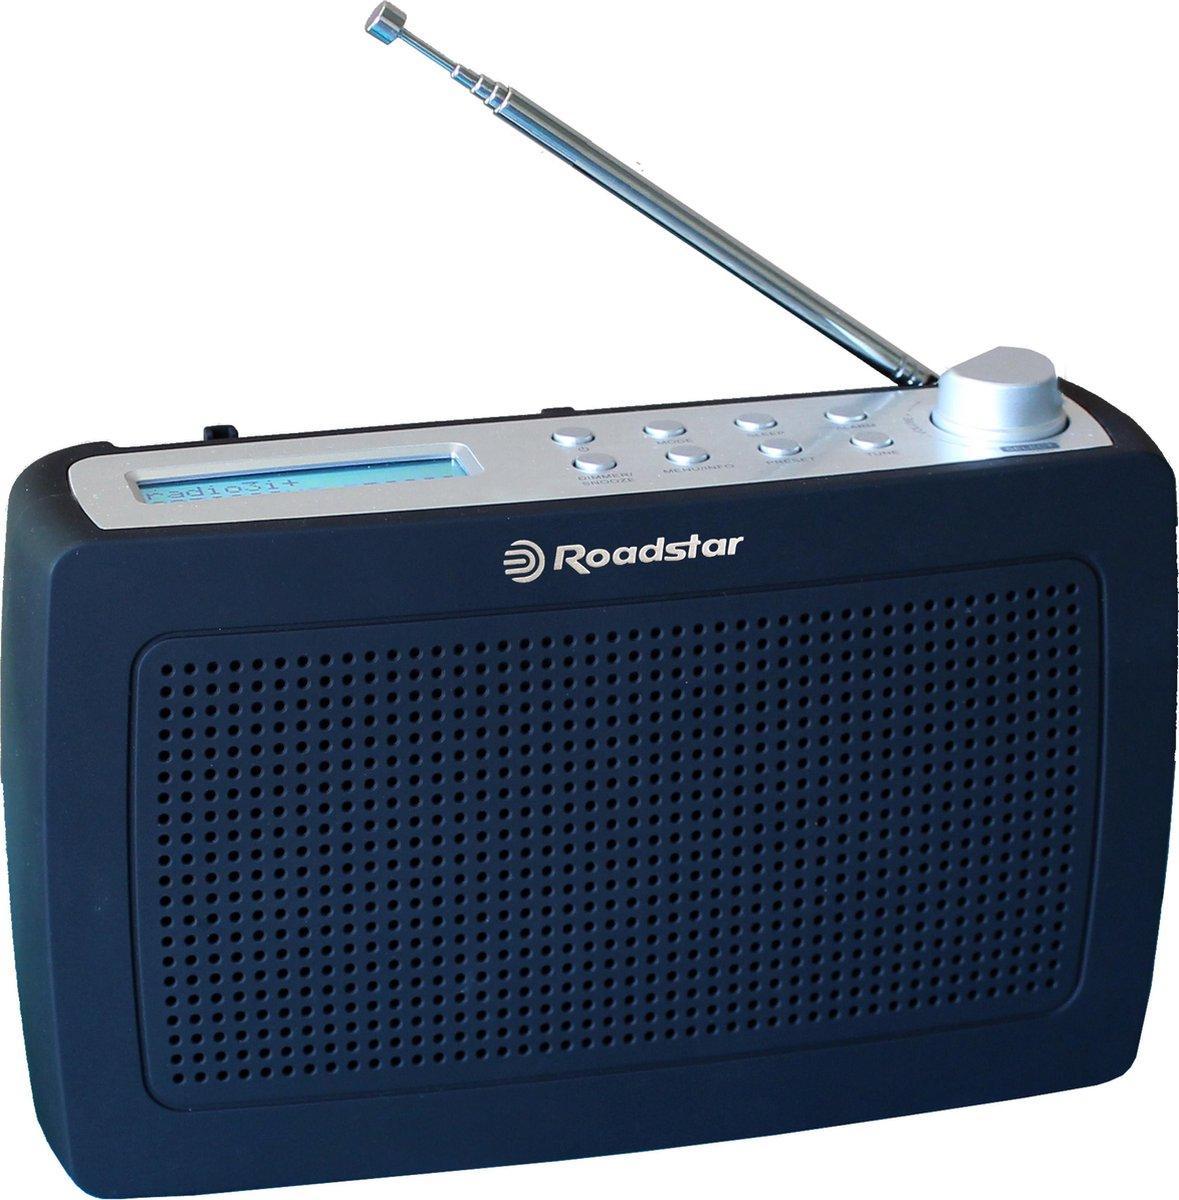 Roadstar TRA-886D+ Portable radio DAB+, FM DAB+, FM Black